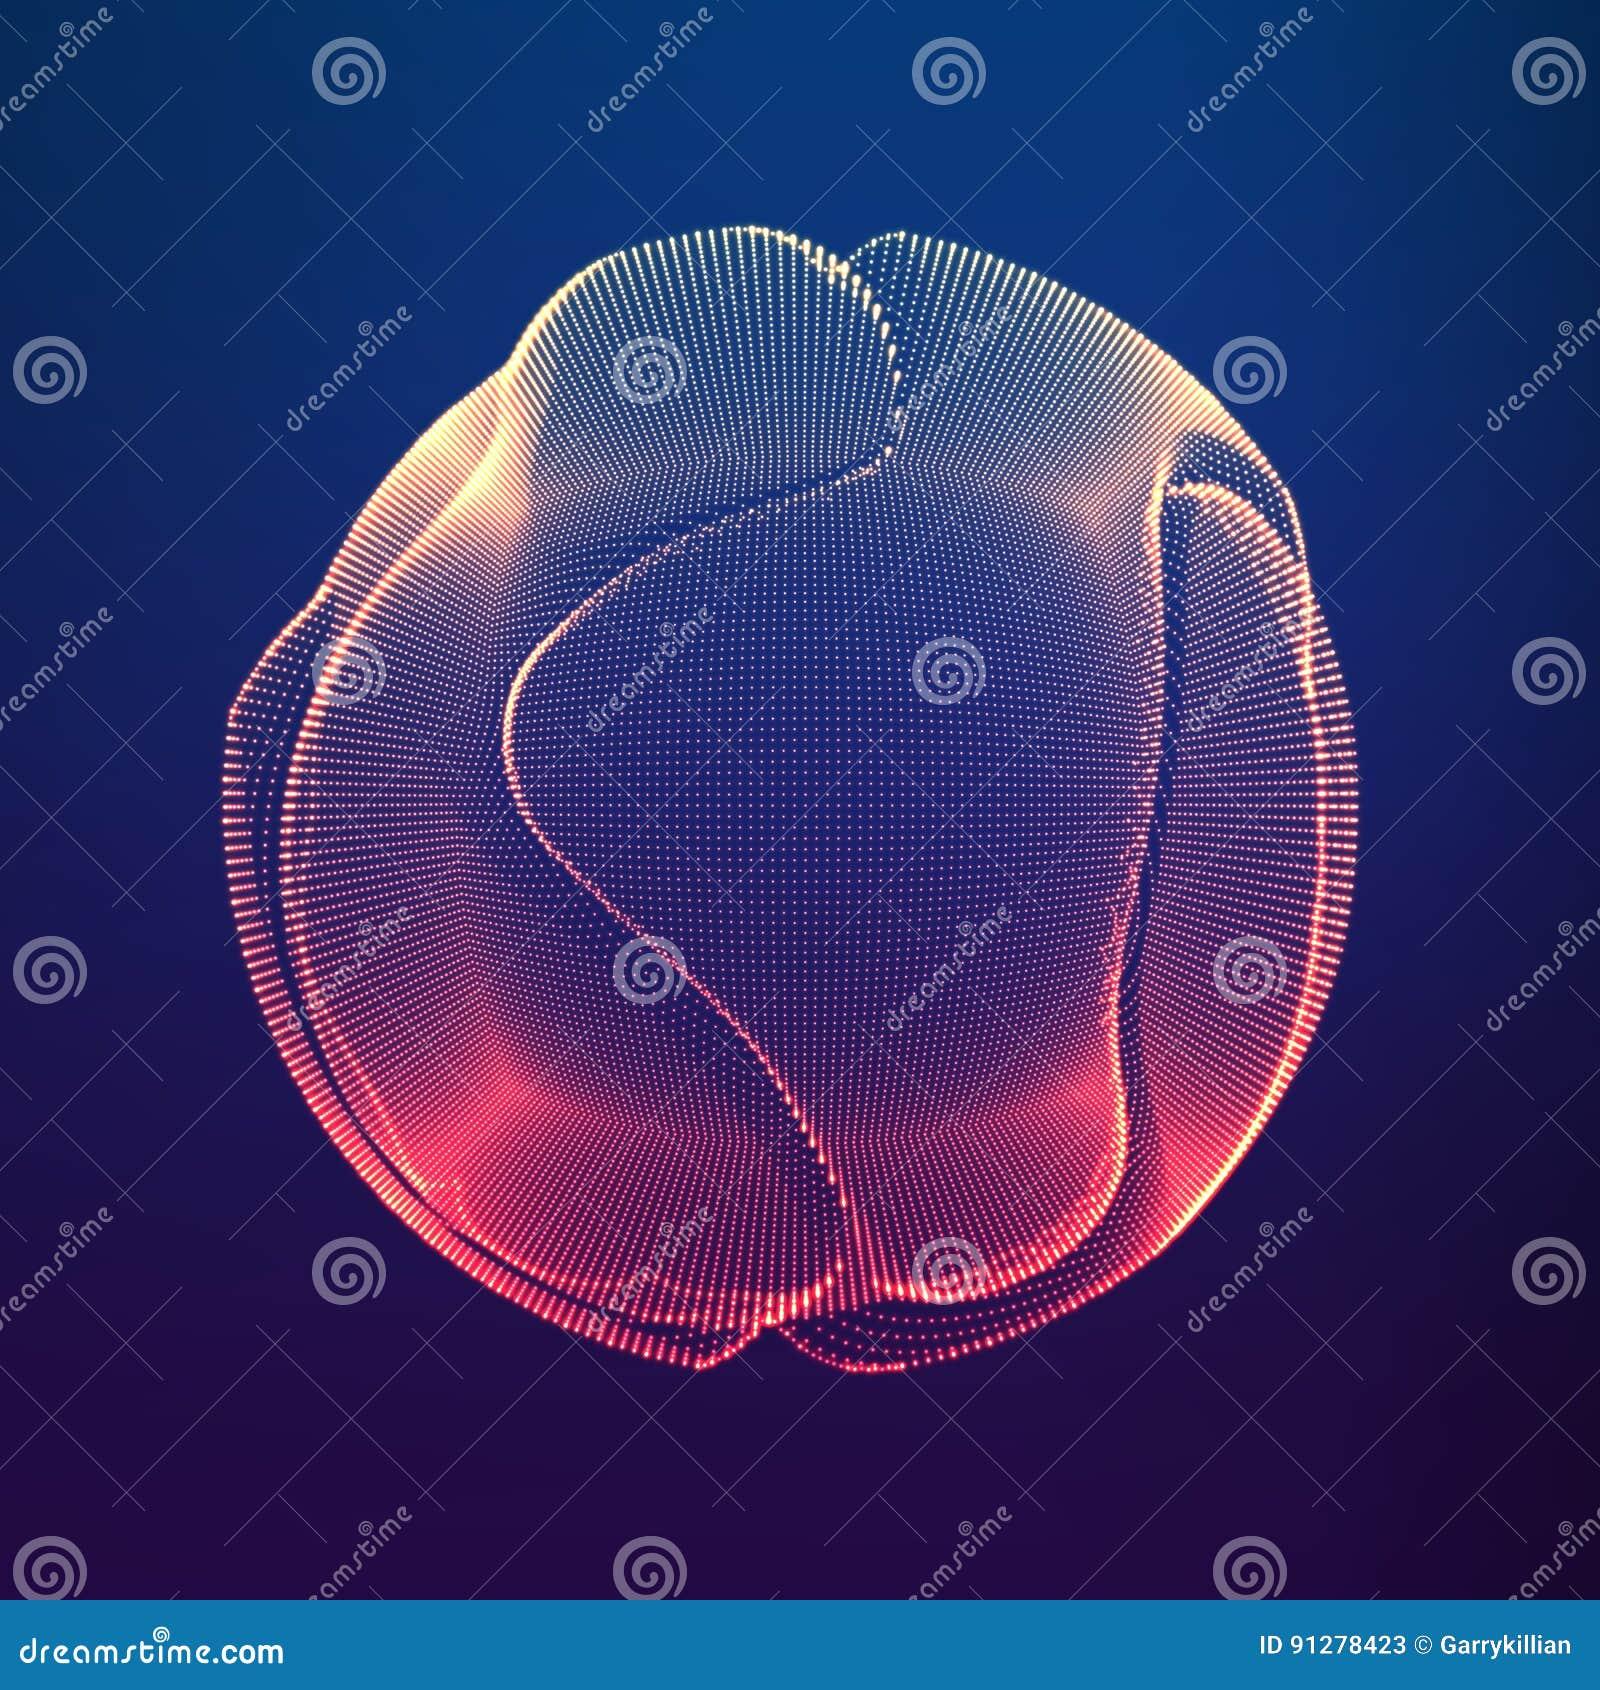 Esfera colorida da malha do vetor abstrato no fundo violeta escuro Cartão futurista do estilo